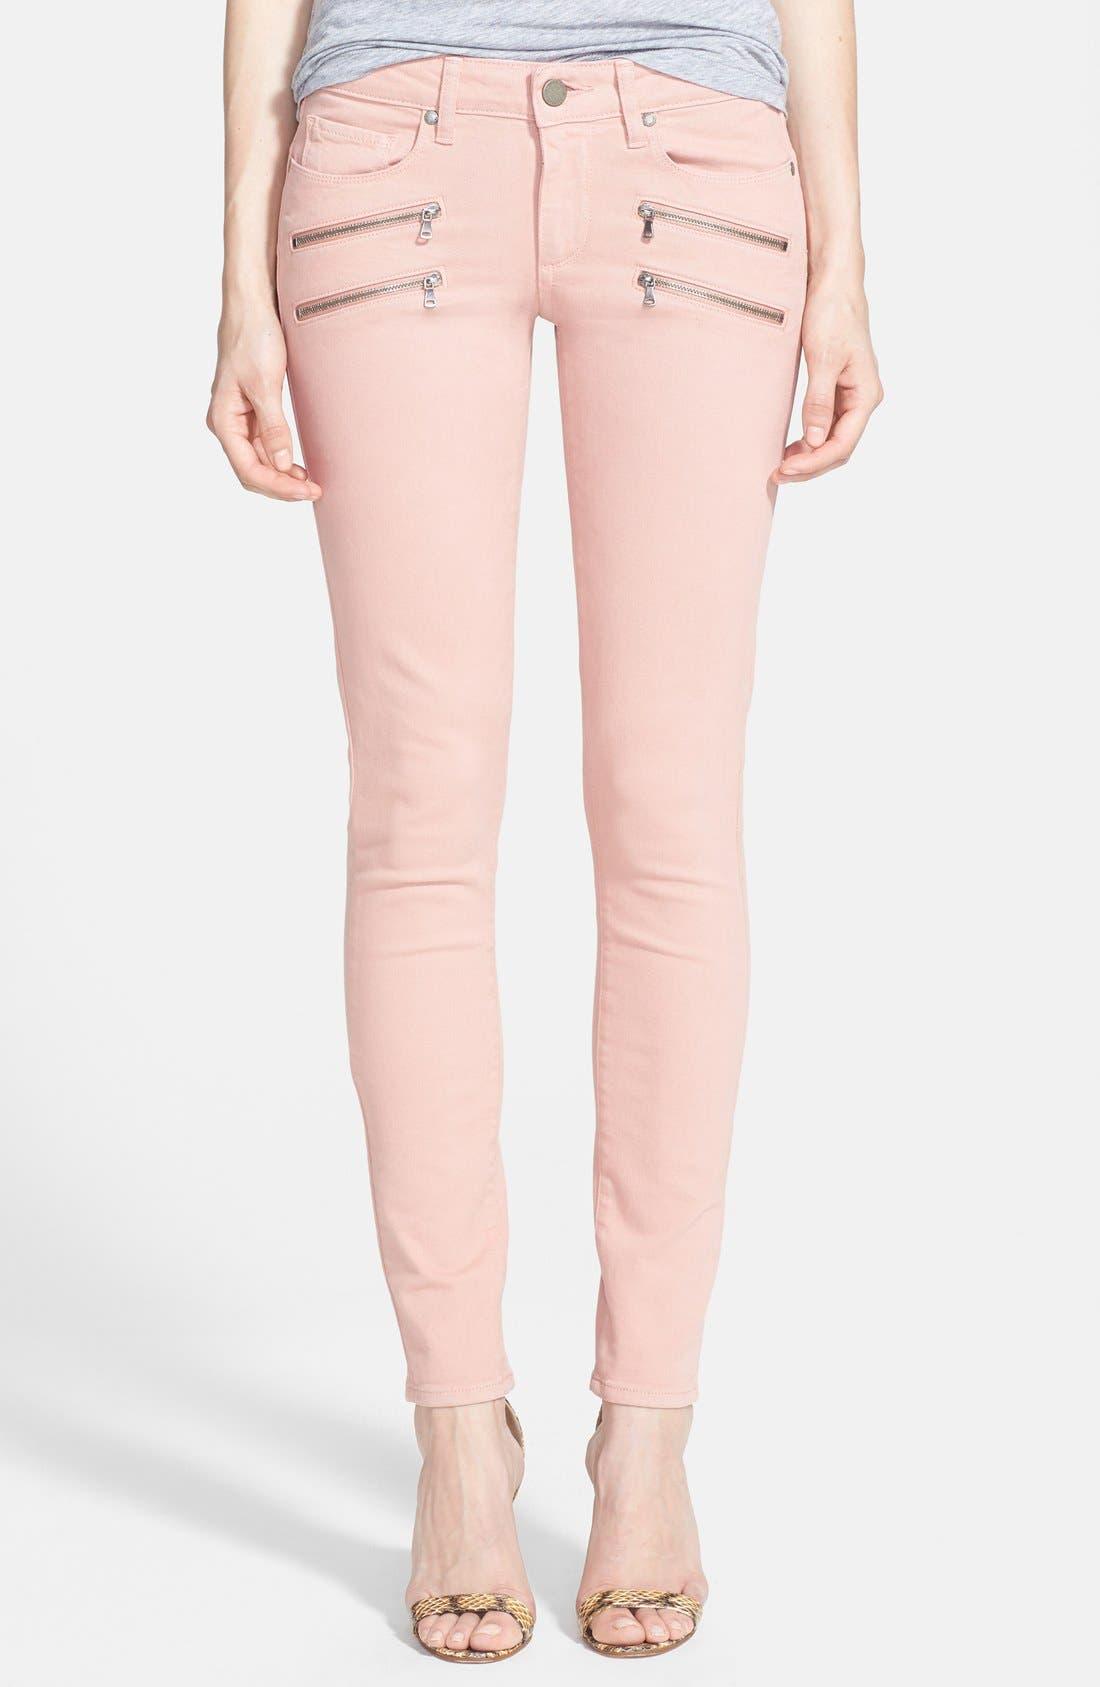 Alternate Image 1 Selected - Paige Denim 'Edgemont' Ultra Skinny Jeans (Ballet Pink)